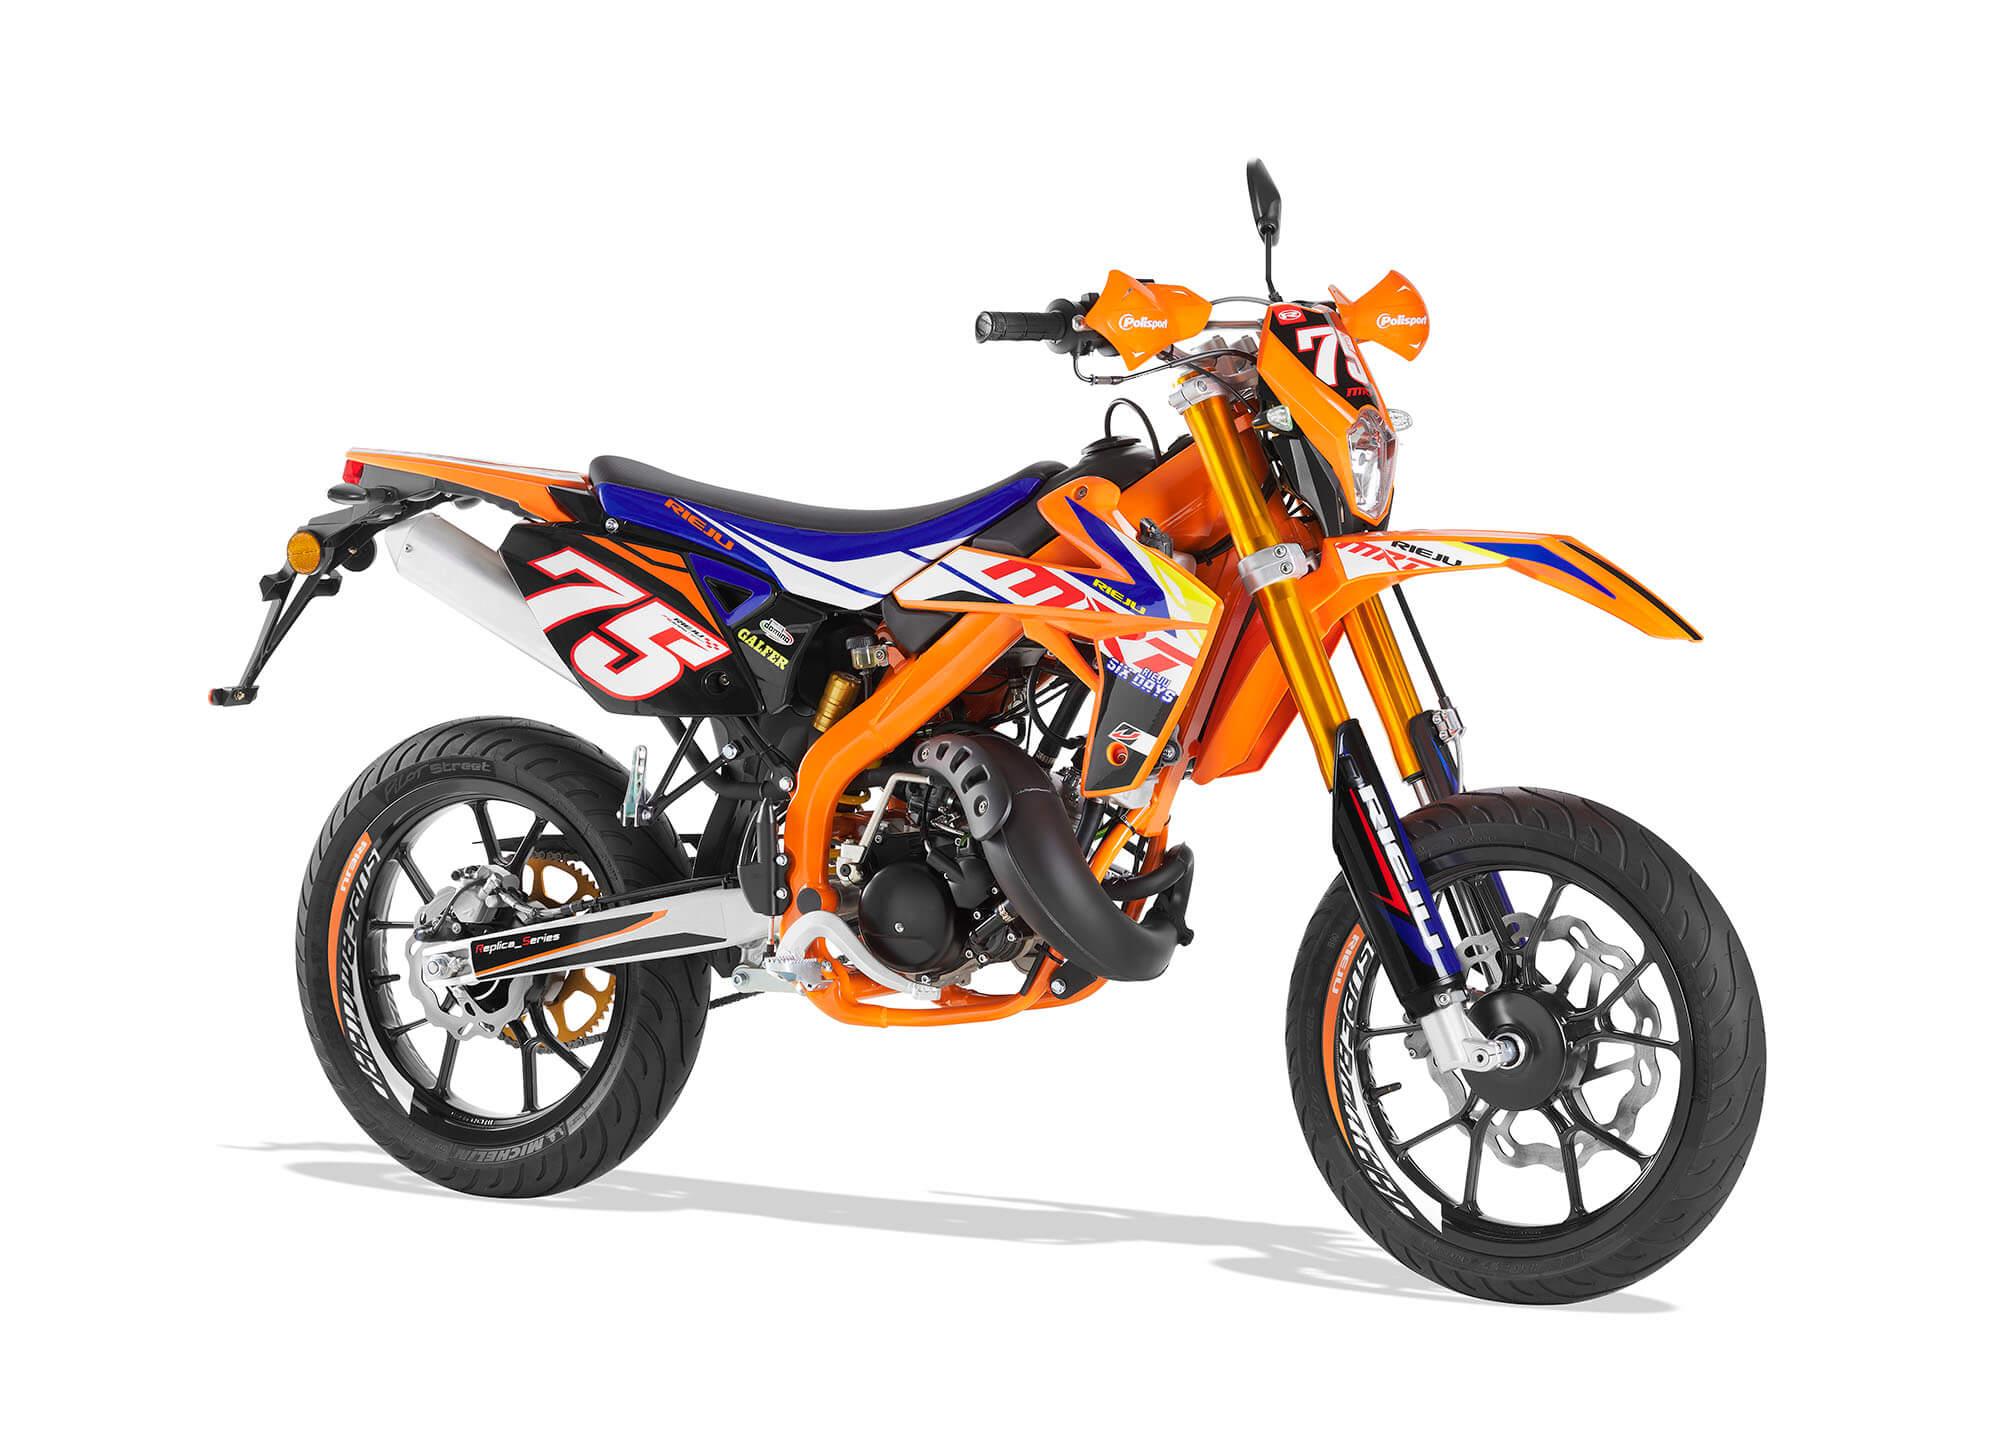 comprar-motos-rieju-mrt-pro-replica-sm-50-naranja-motissimo-barcelona